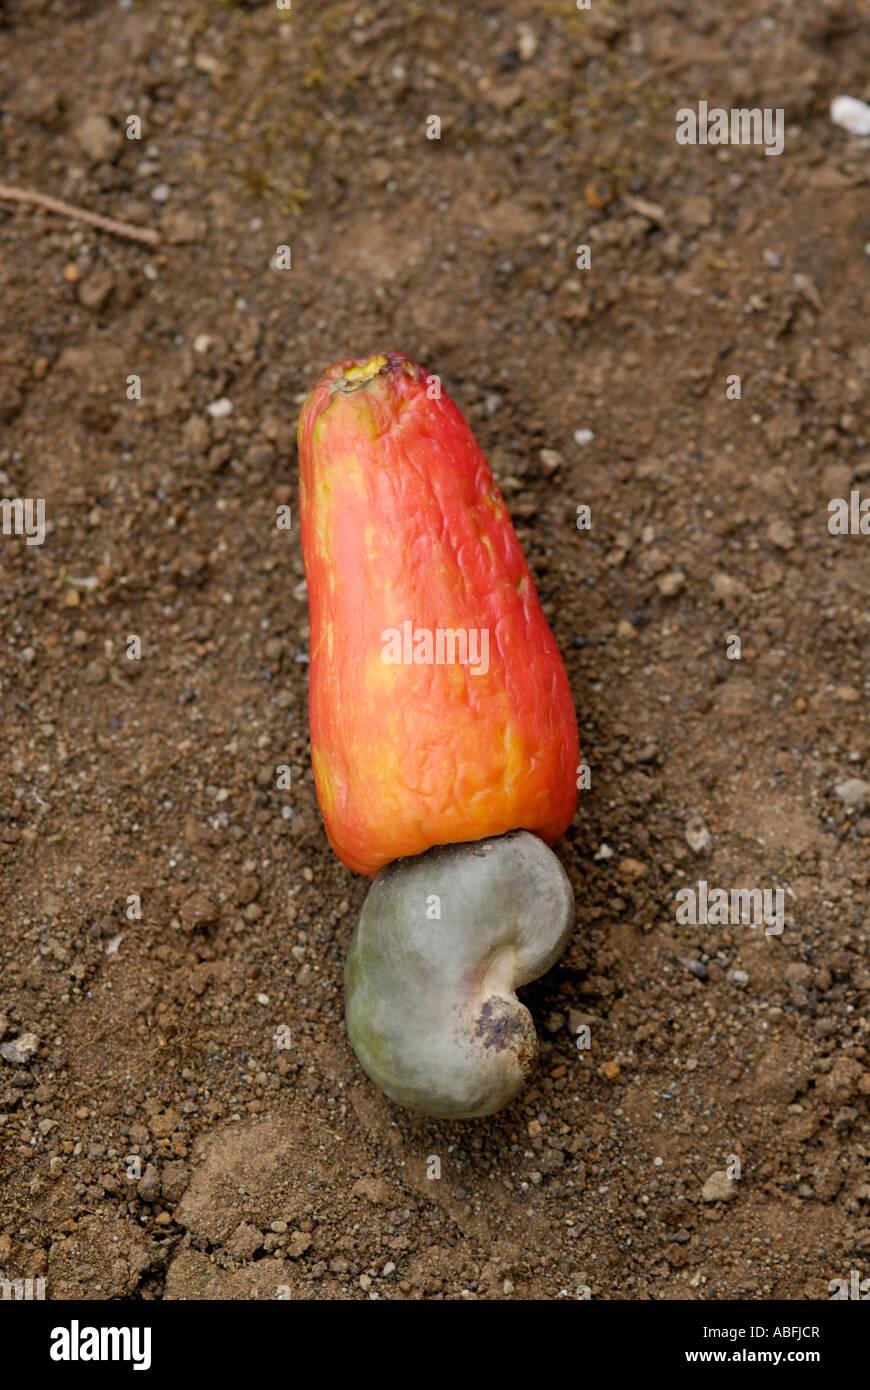 The fruit of the cashew Anacardium occidentale showing the nut and the false fruit - Stock Image